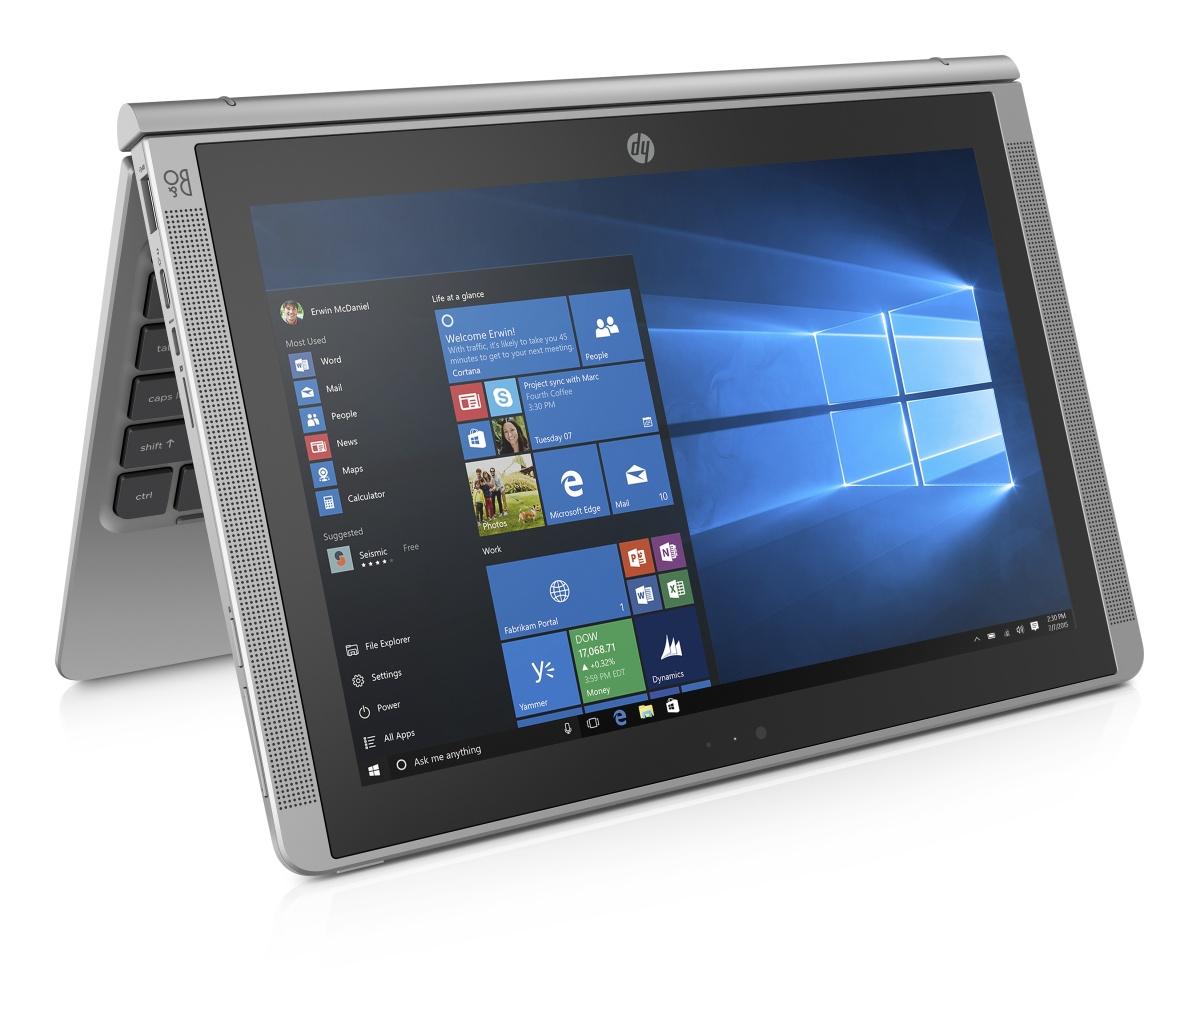 "HP x2 210 G1 Z8300/10.1"" HD (1280x800)/2GB/64GB/ac, BT/kbd/Win 10 Home 64"